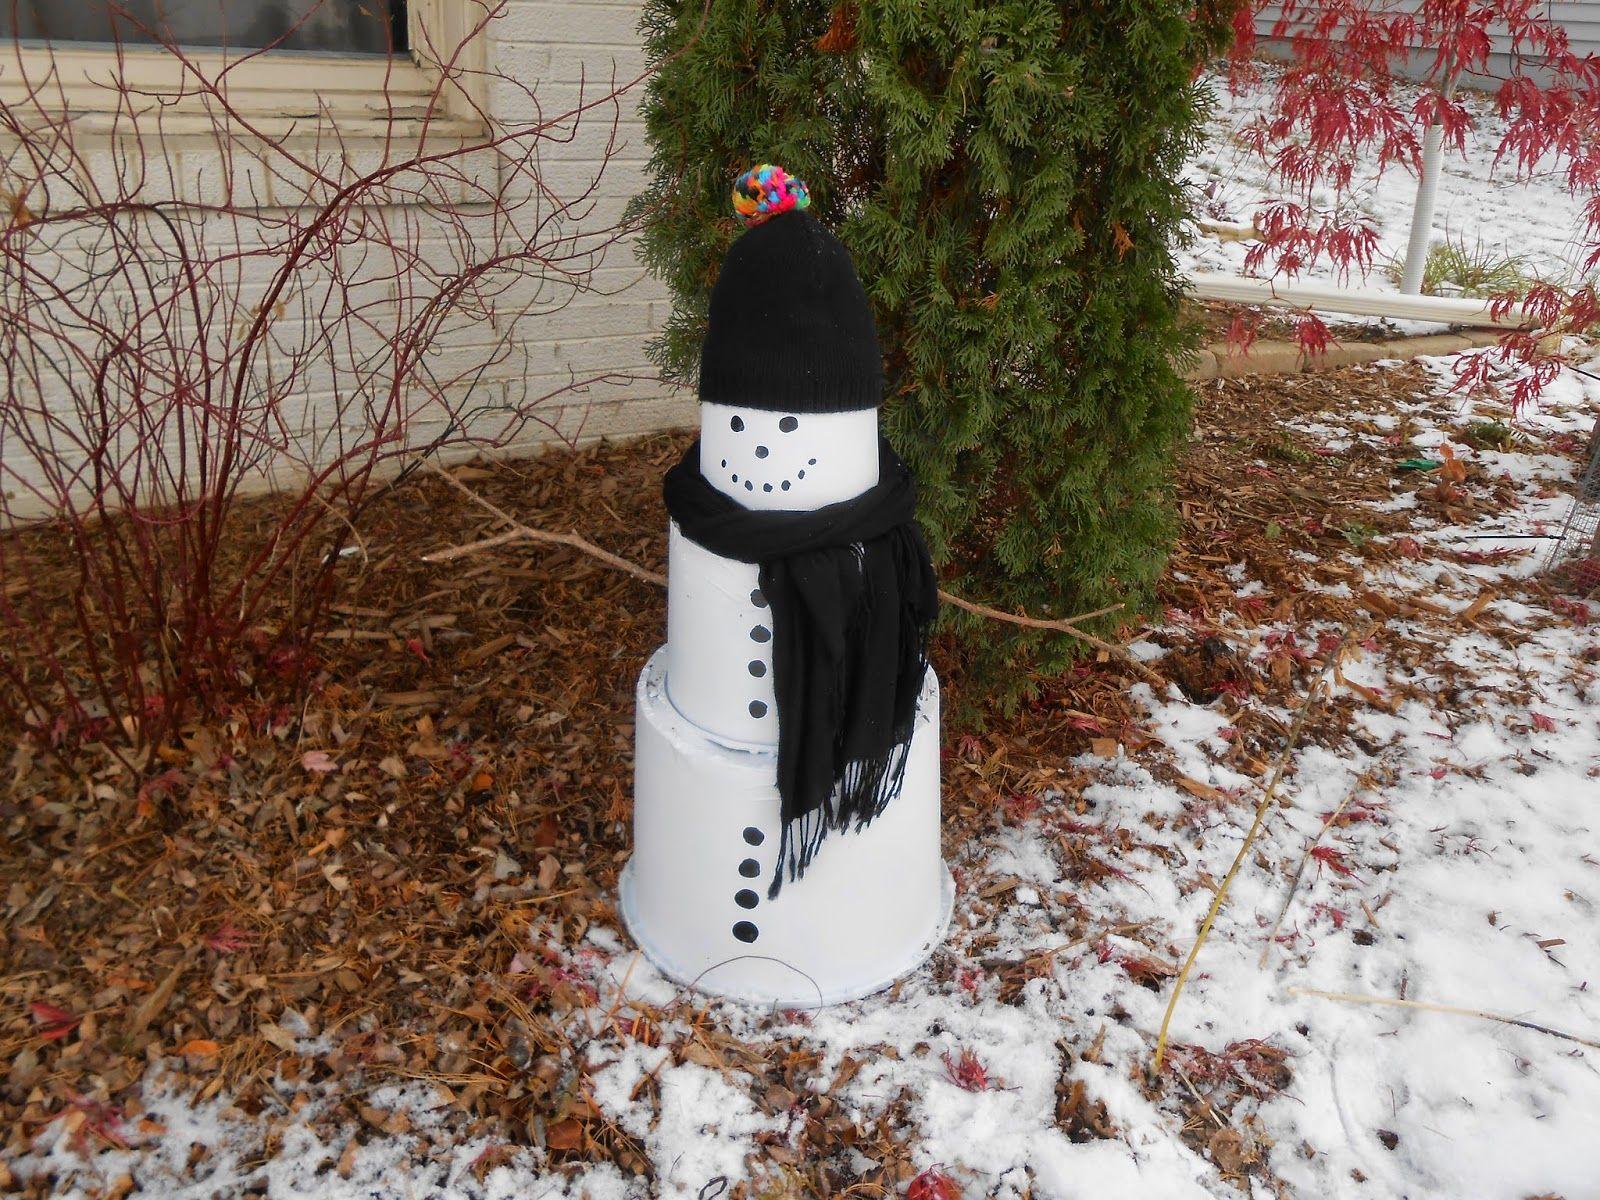 10+ Diy snowman outdoor decorations ideas in 2021